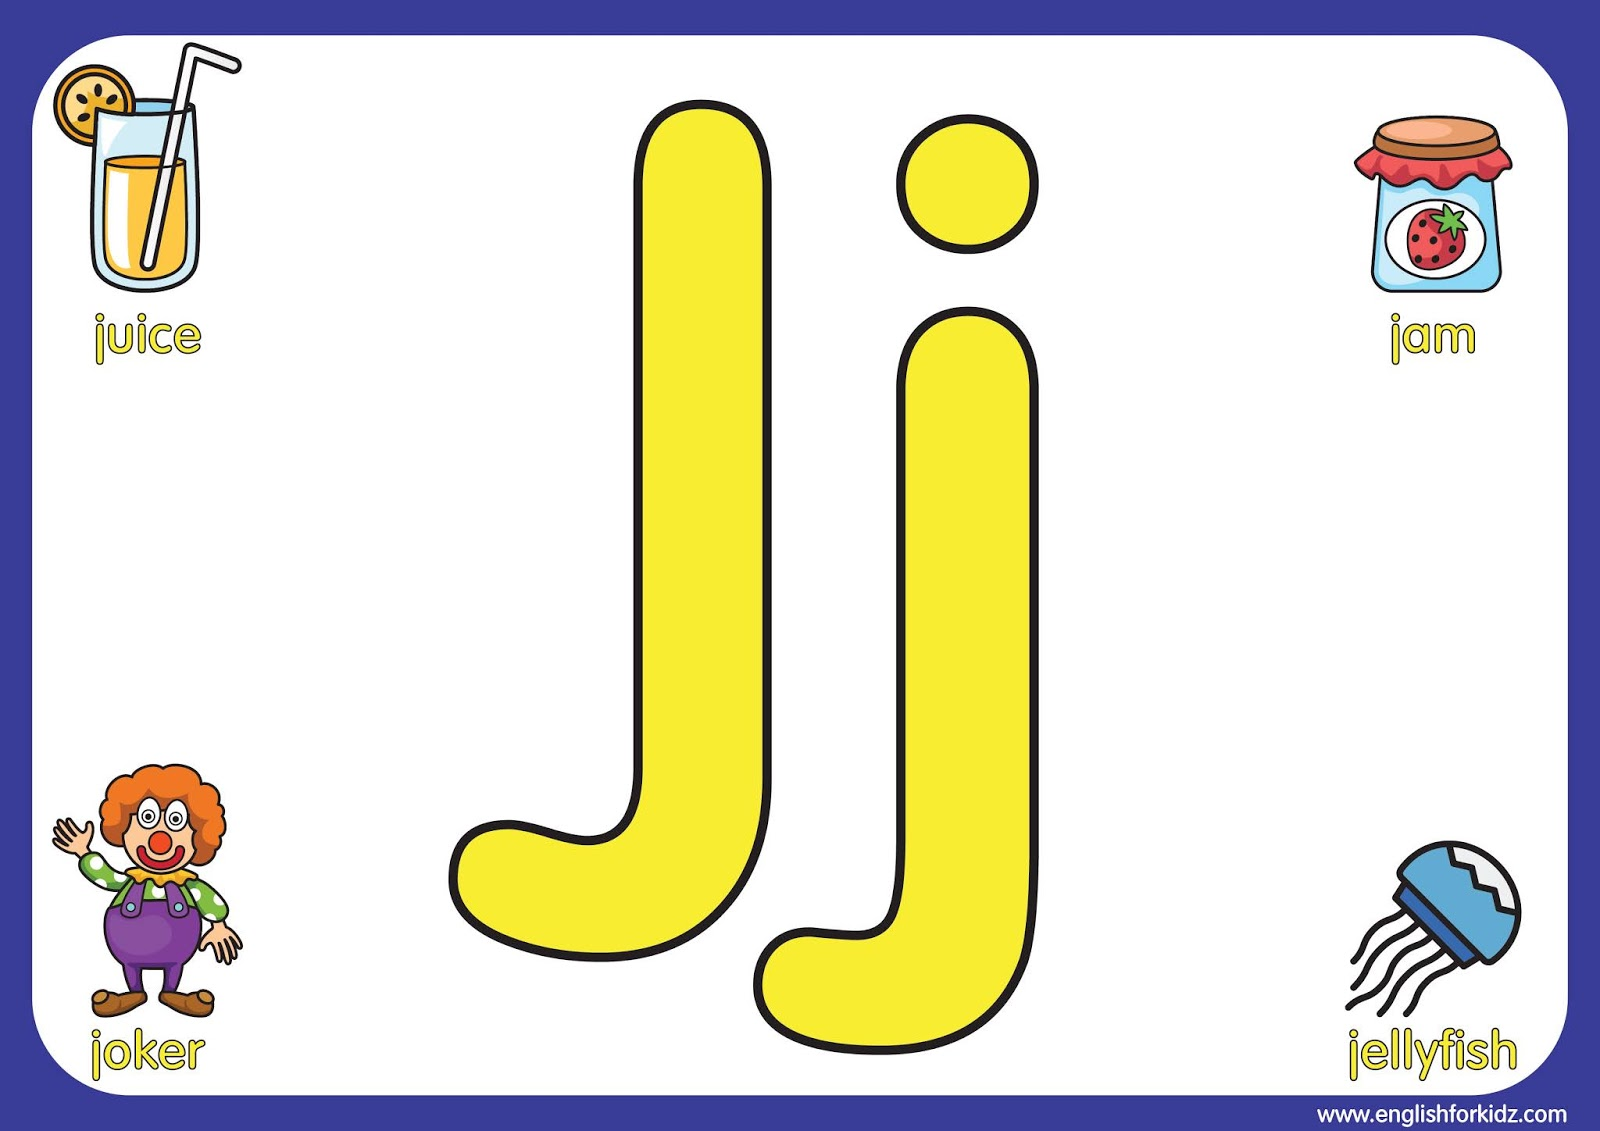 English For Kids Step By Step Letter J Worksheets Flash